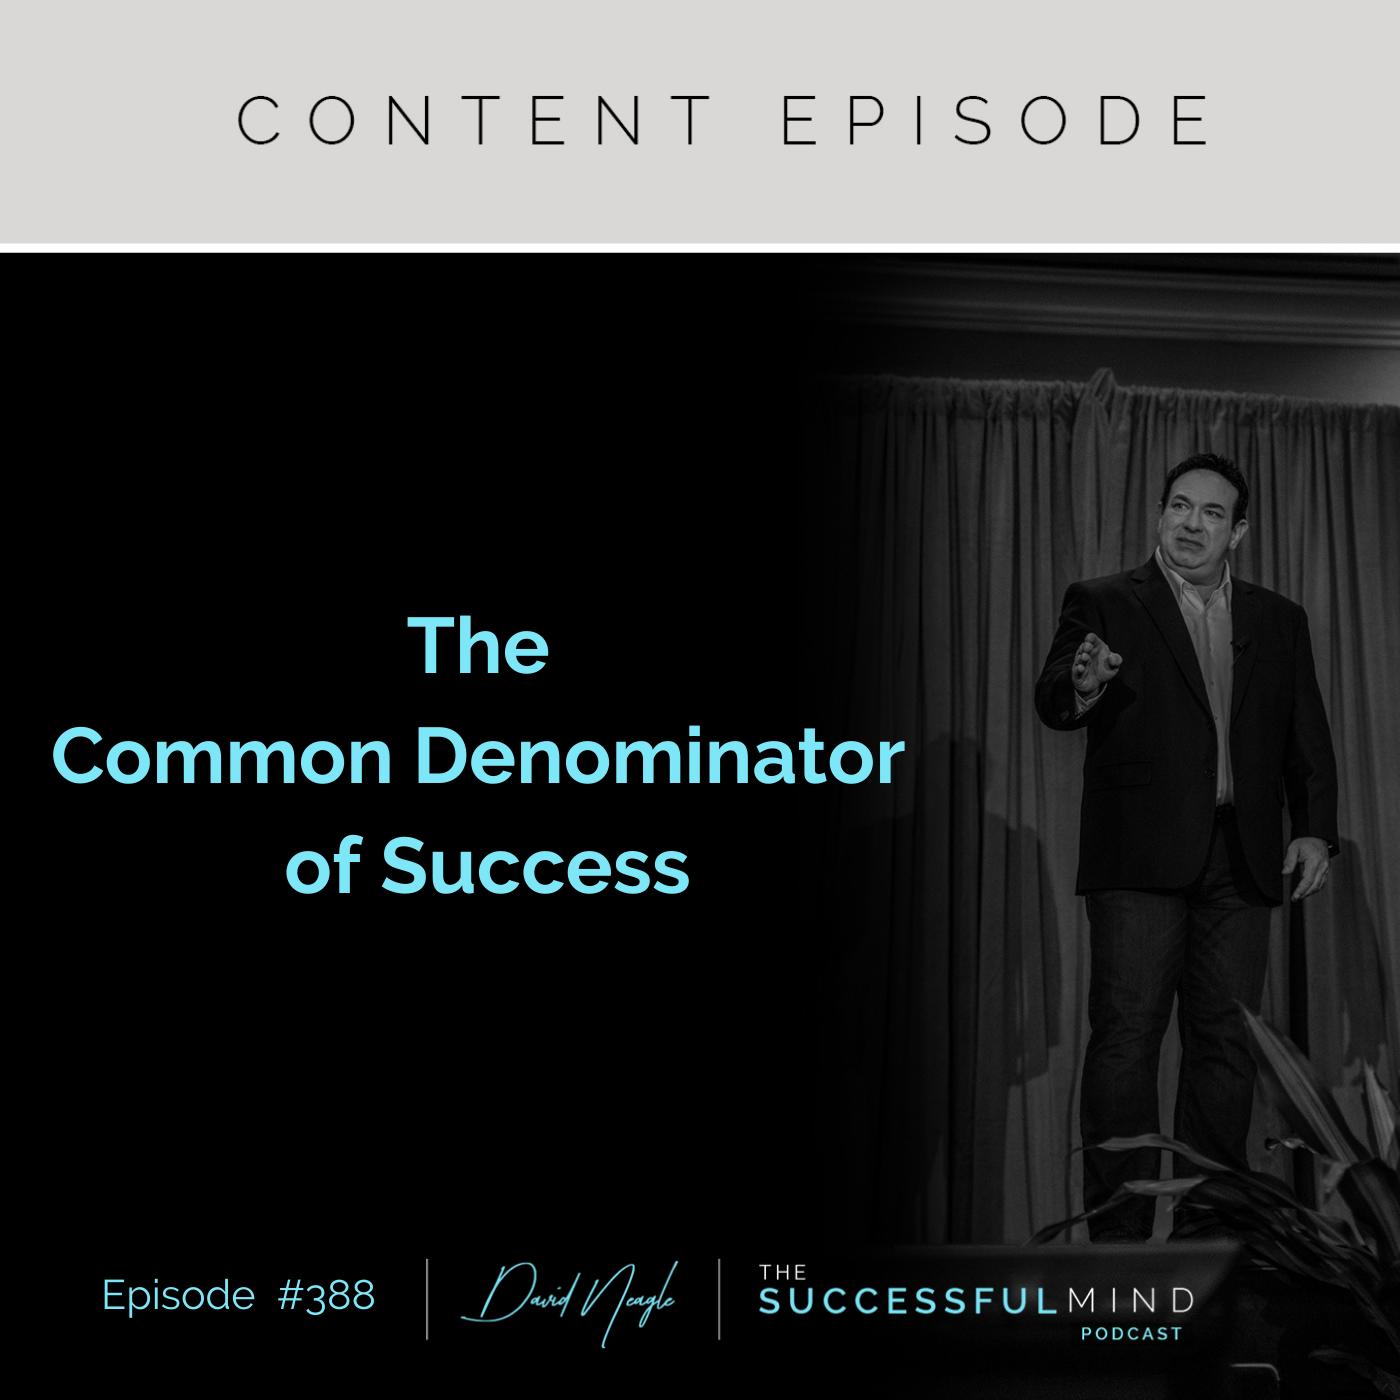 The Successful Mind Podcast – Episode 388 – The Common Denominator of Success